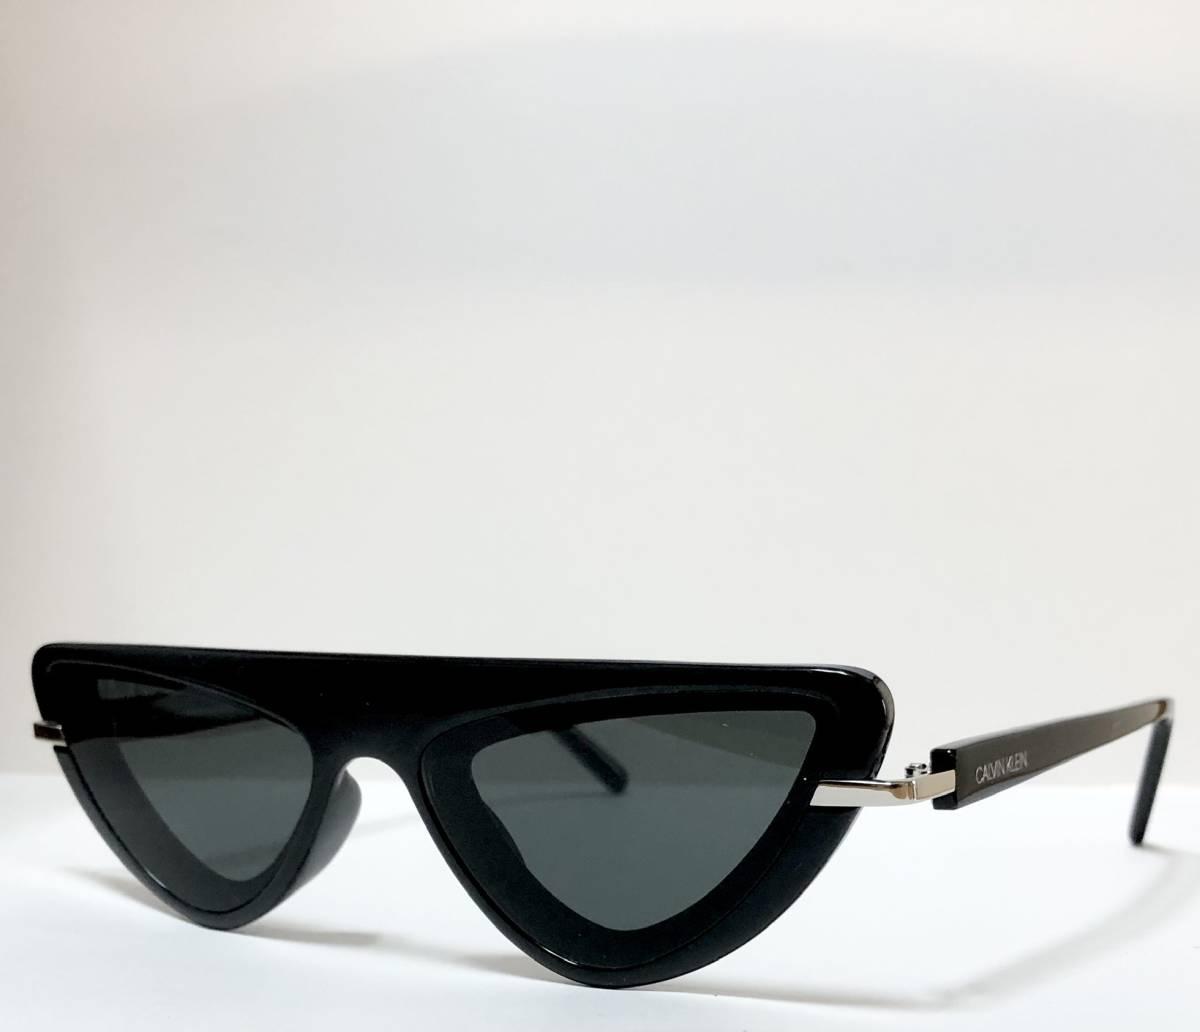 CK カルバンクライン 芸術的なサングラス イタリア製 純正・新品 ケース付き 米国ブランド Calvin Klein メガネ可能_画像3